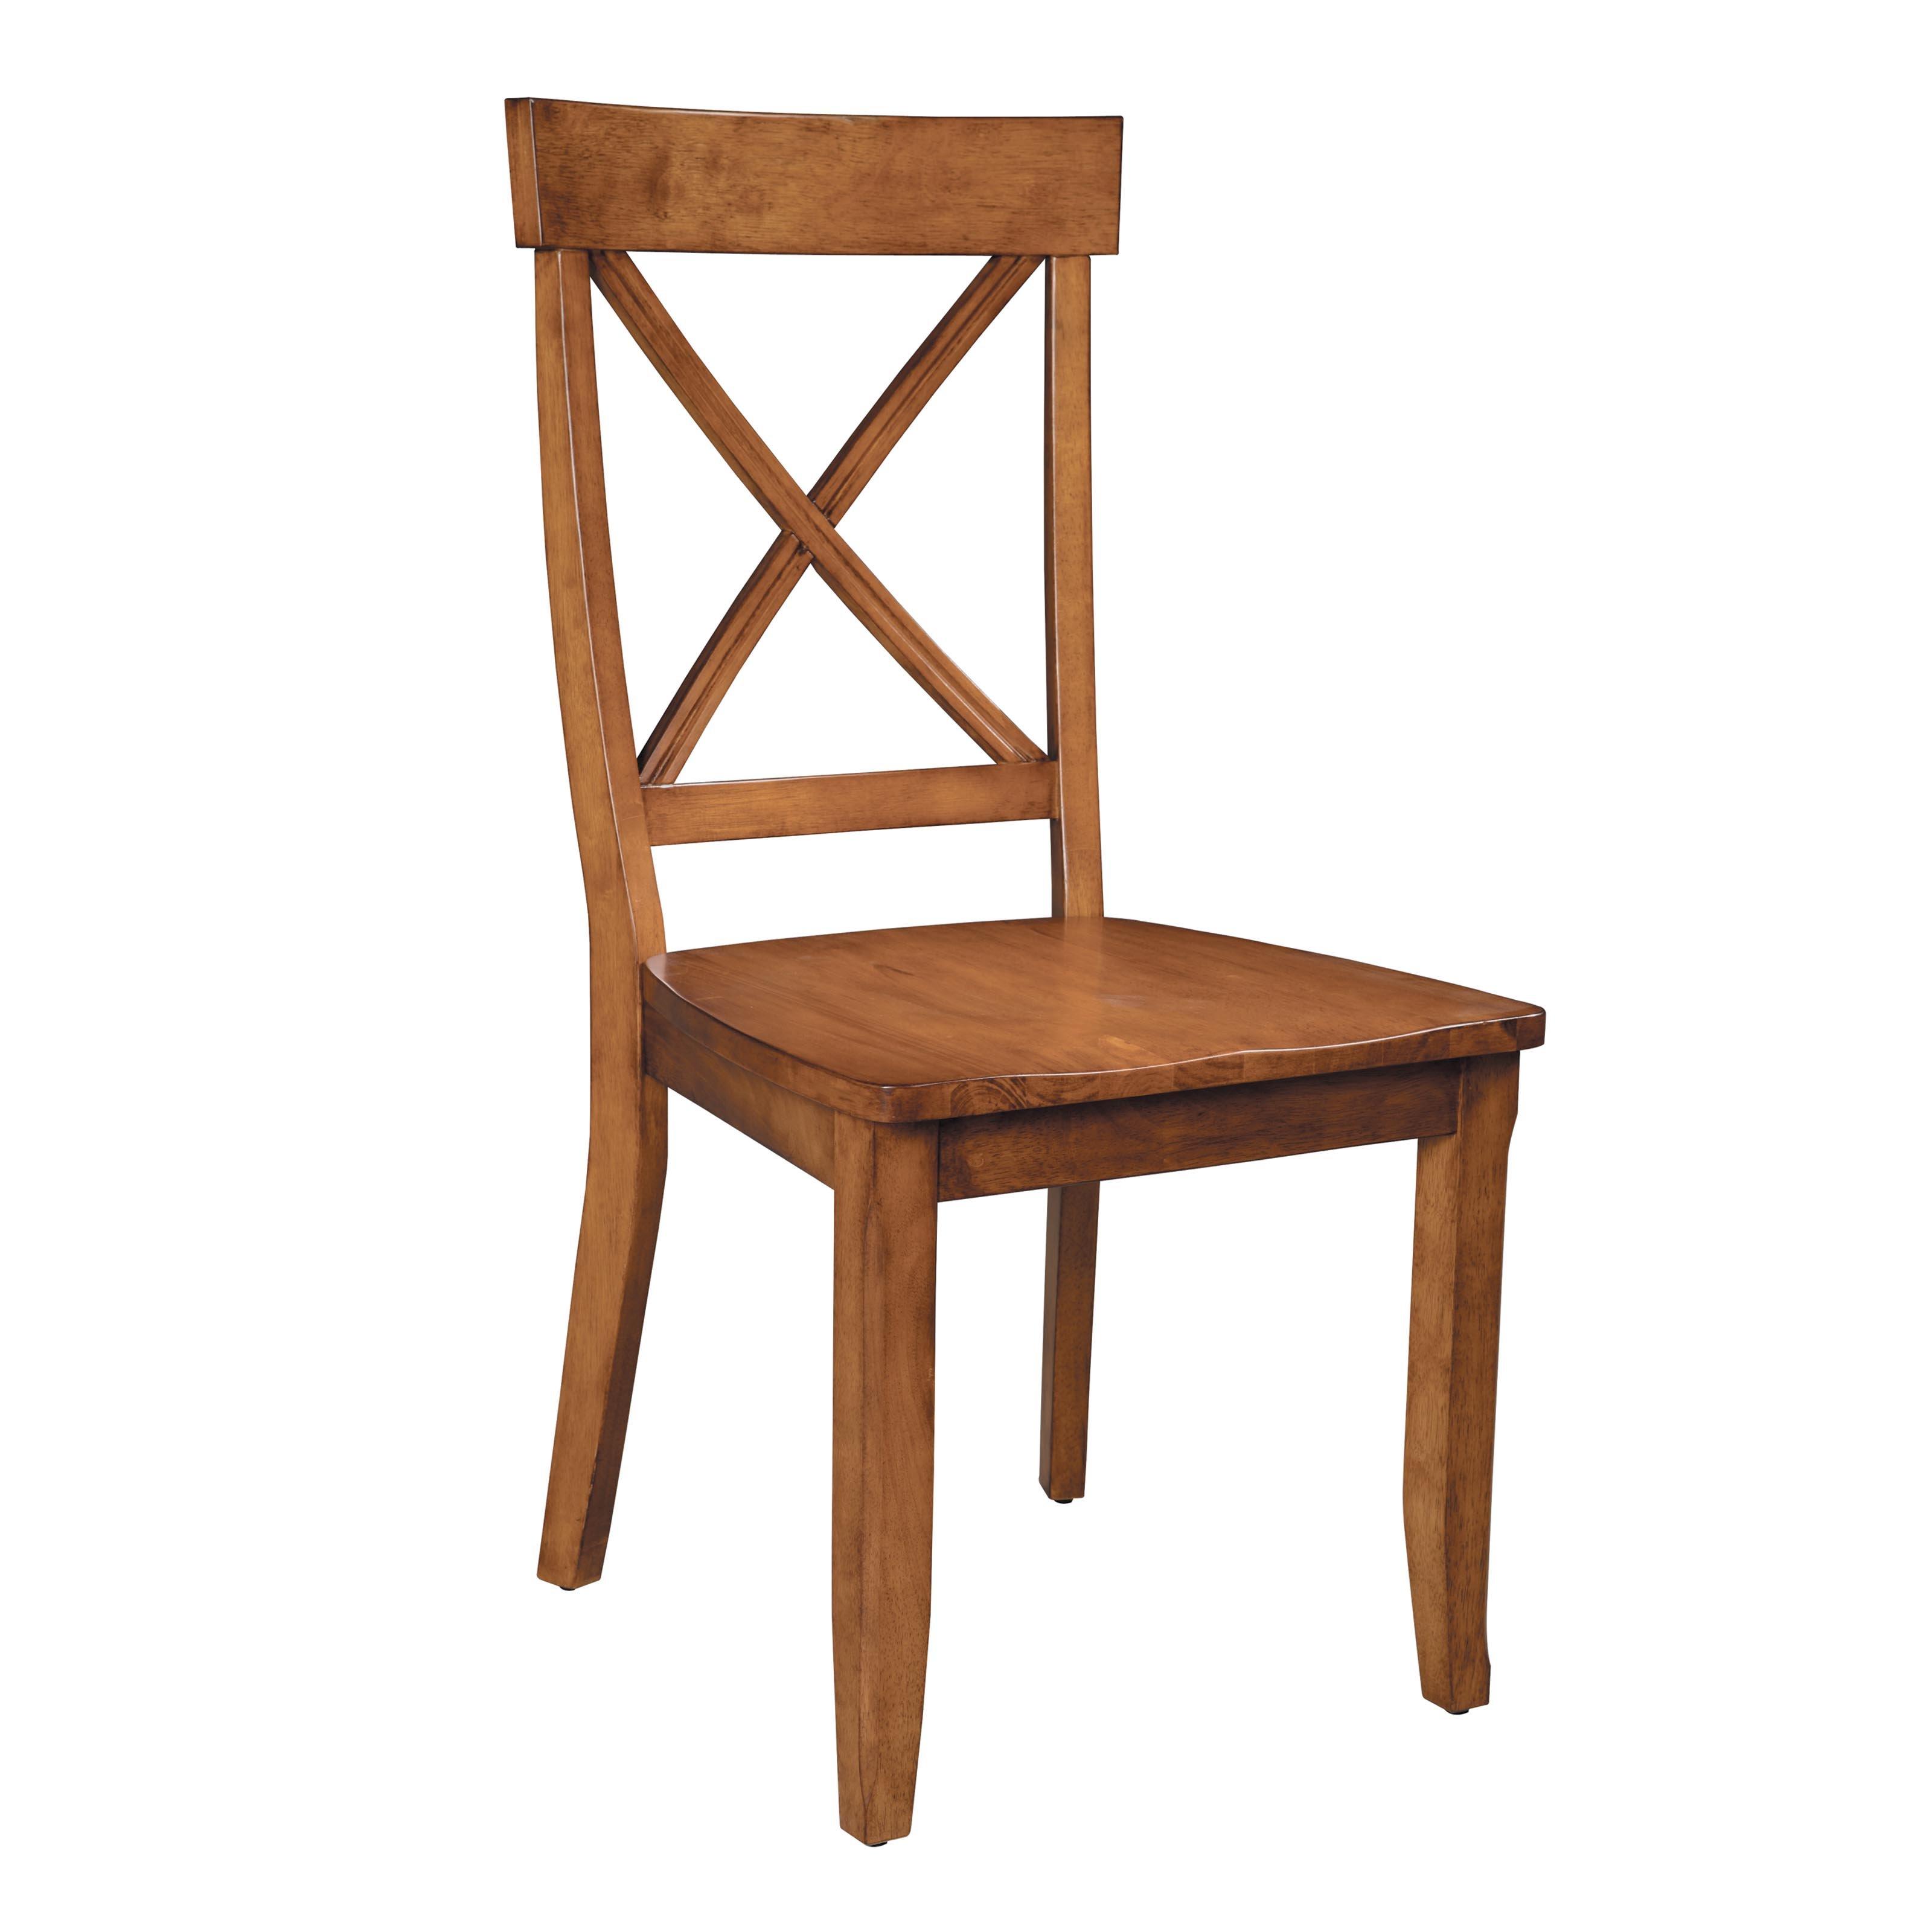 Kitchen chairs wood Photo - 1